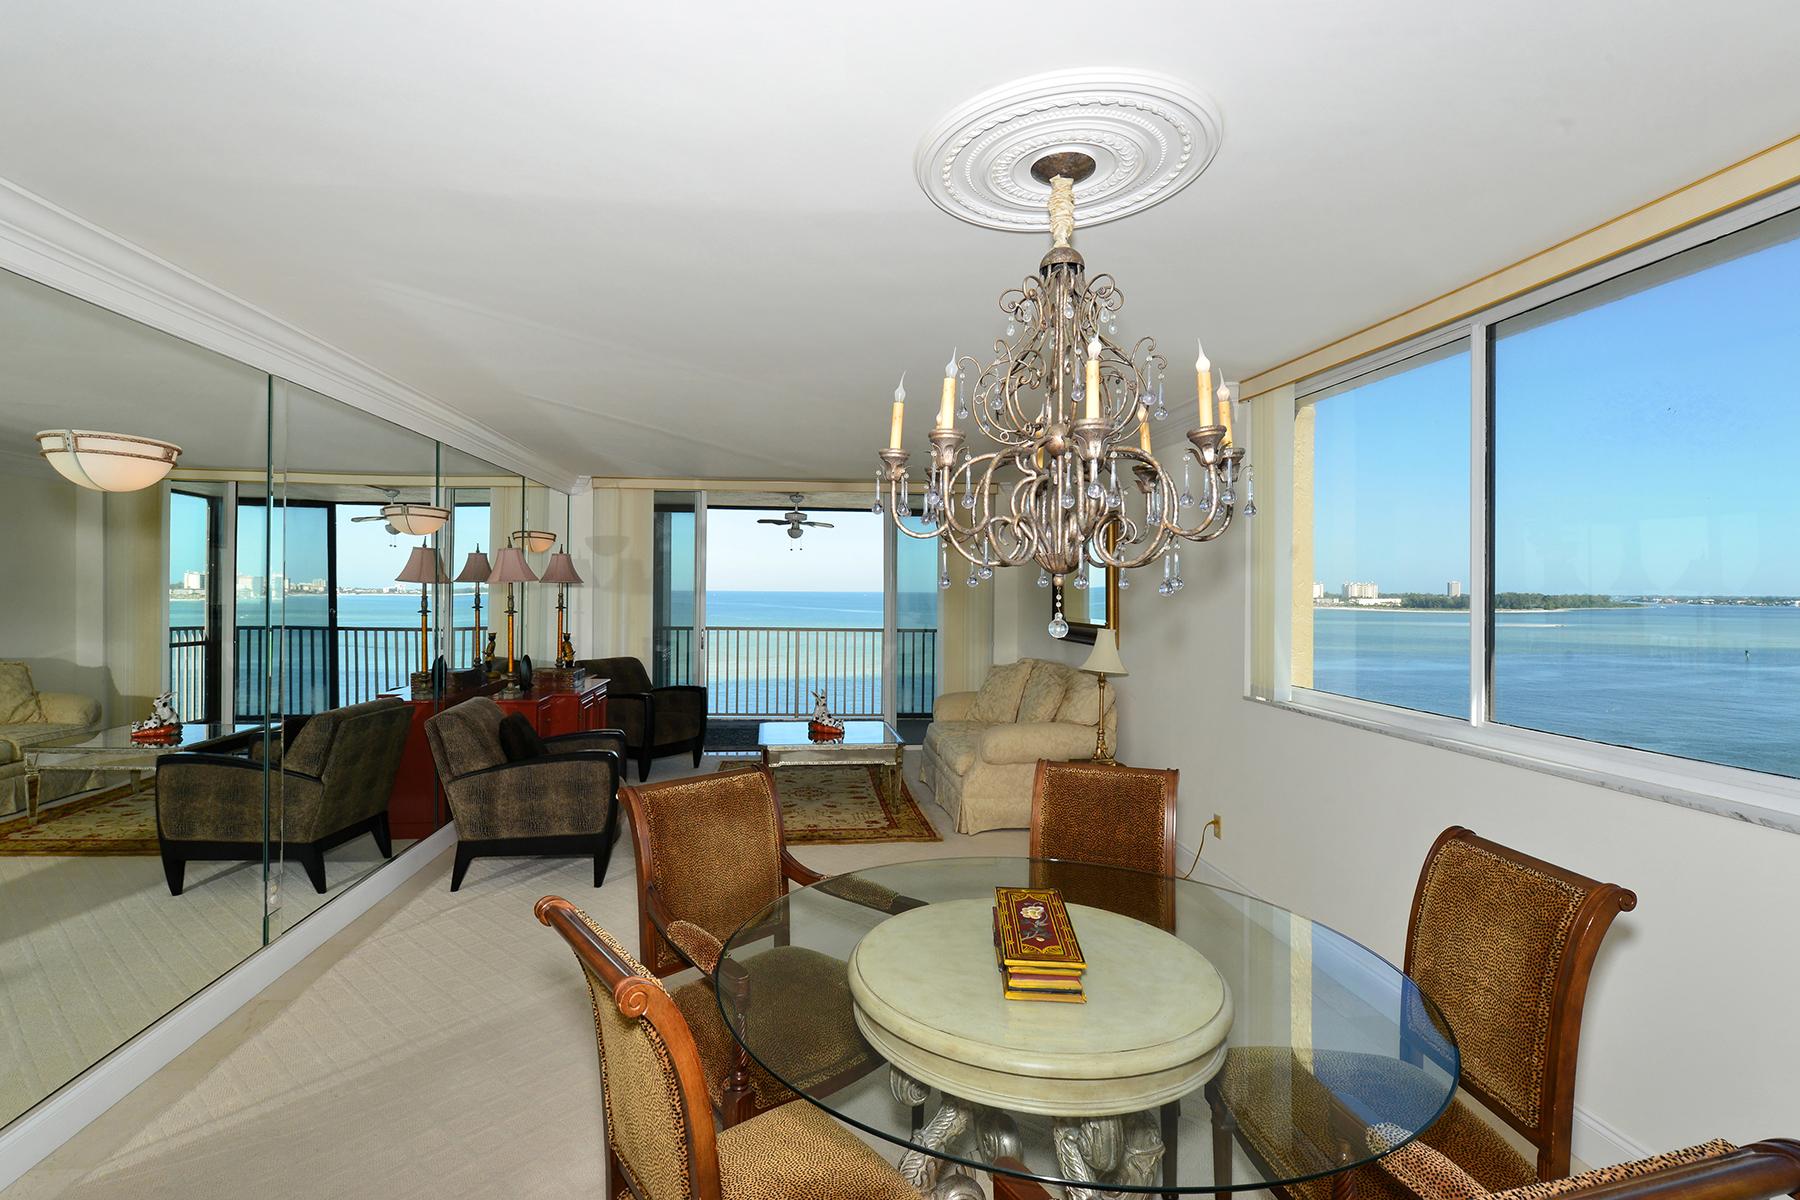 Condomínio para Venda às SIESTA TOWERS 4822 Ocean Blvd 9C Sarasota, Florida 34242 Estados Unidos